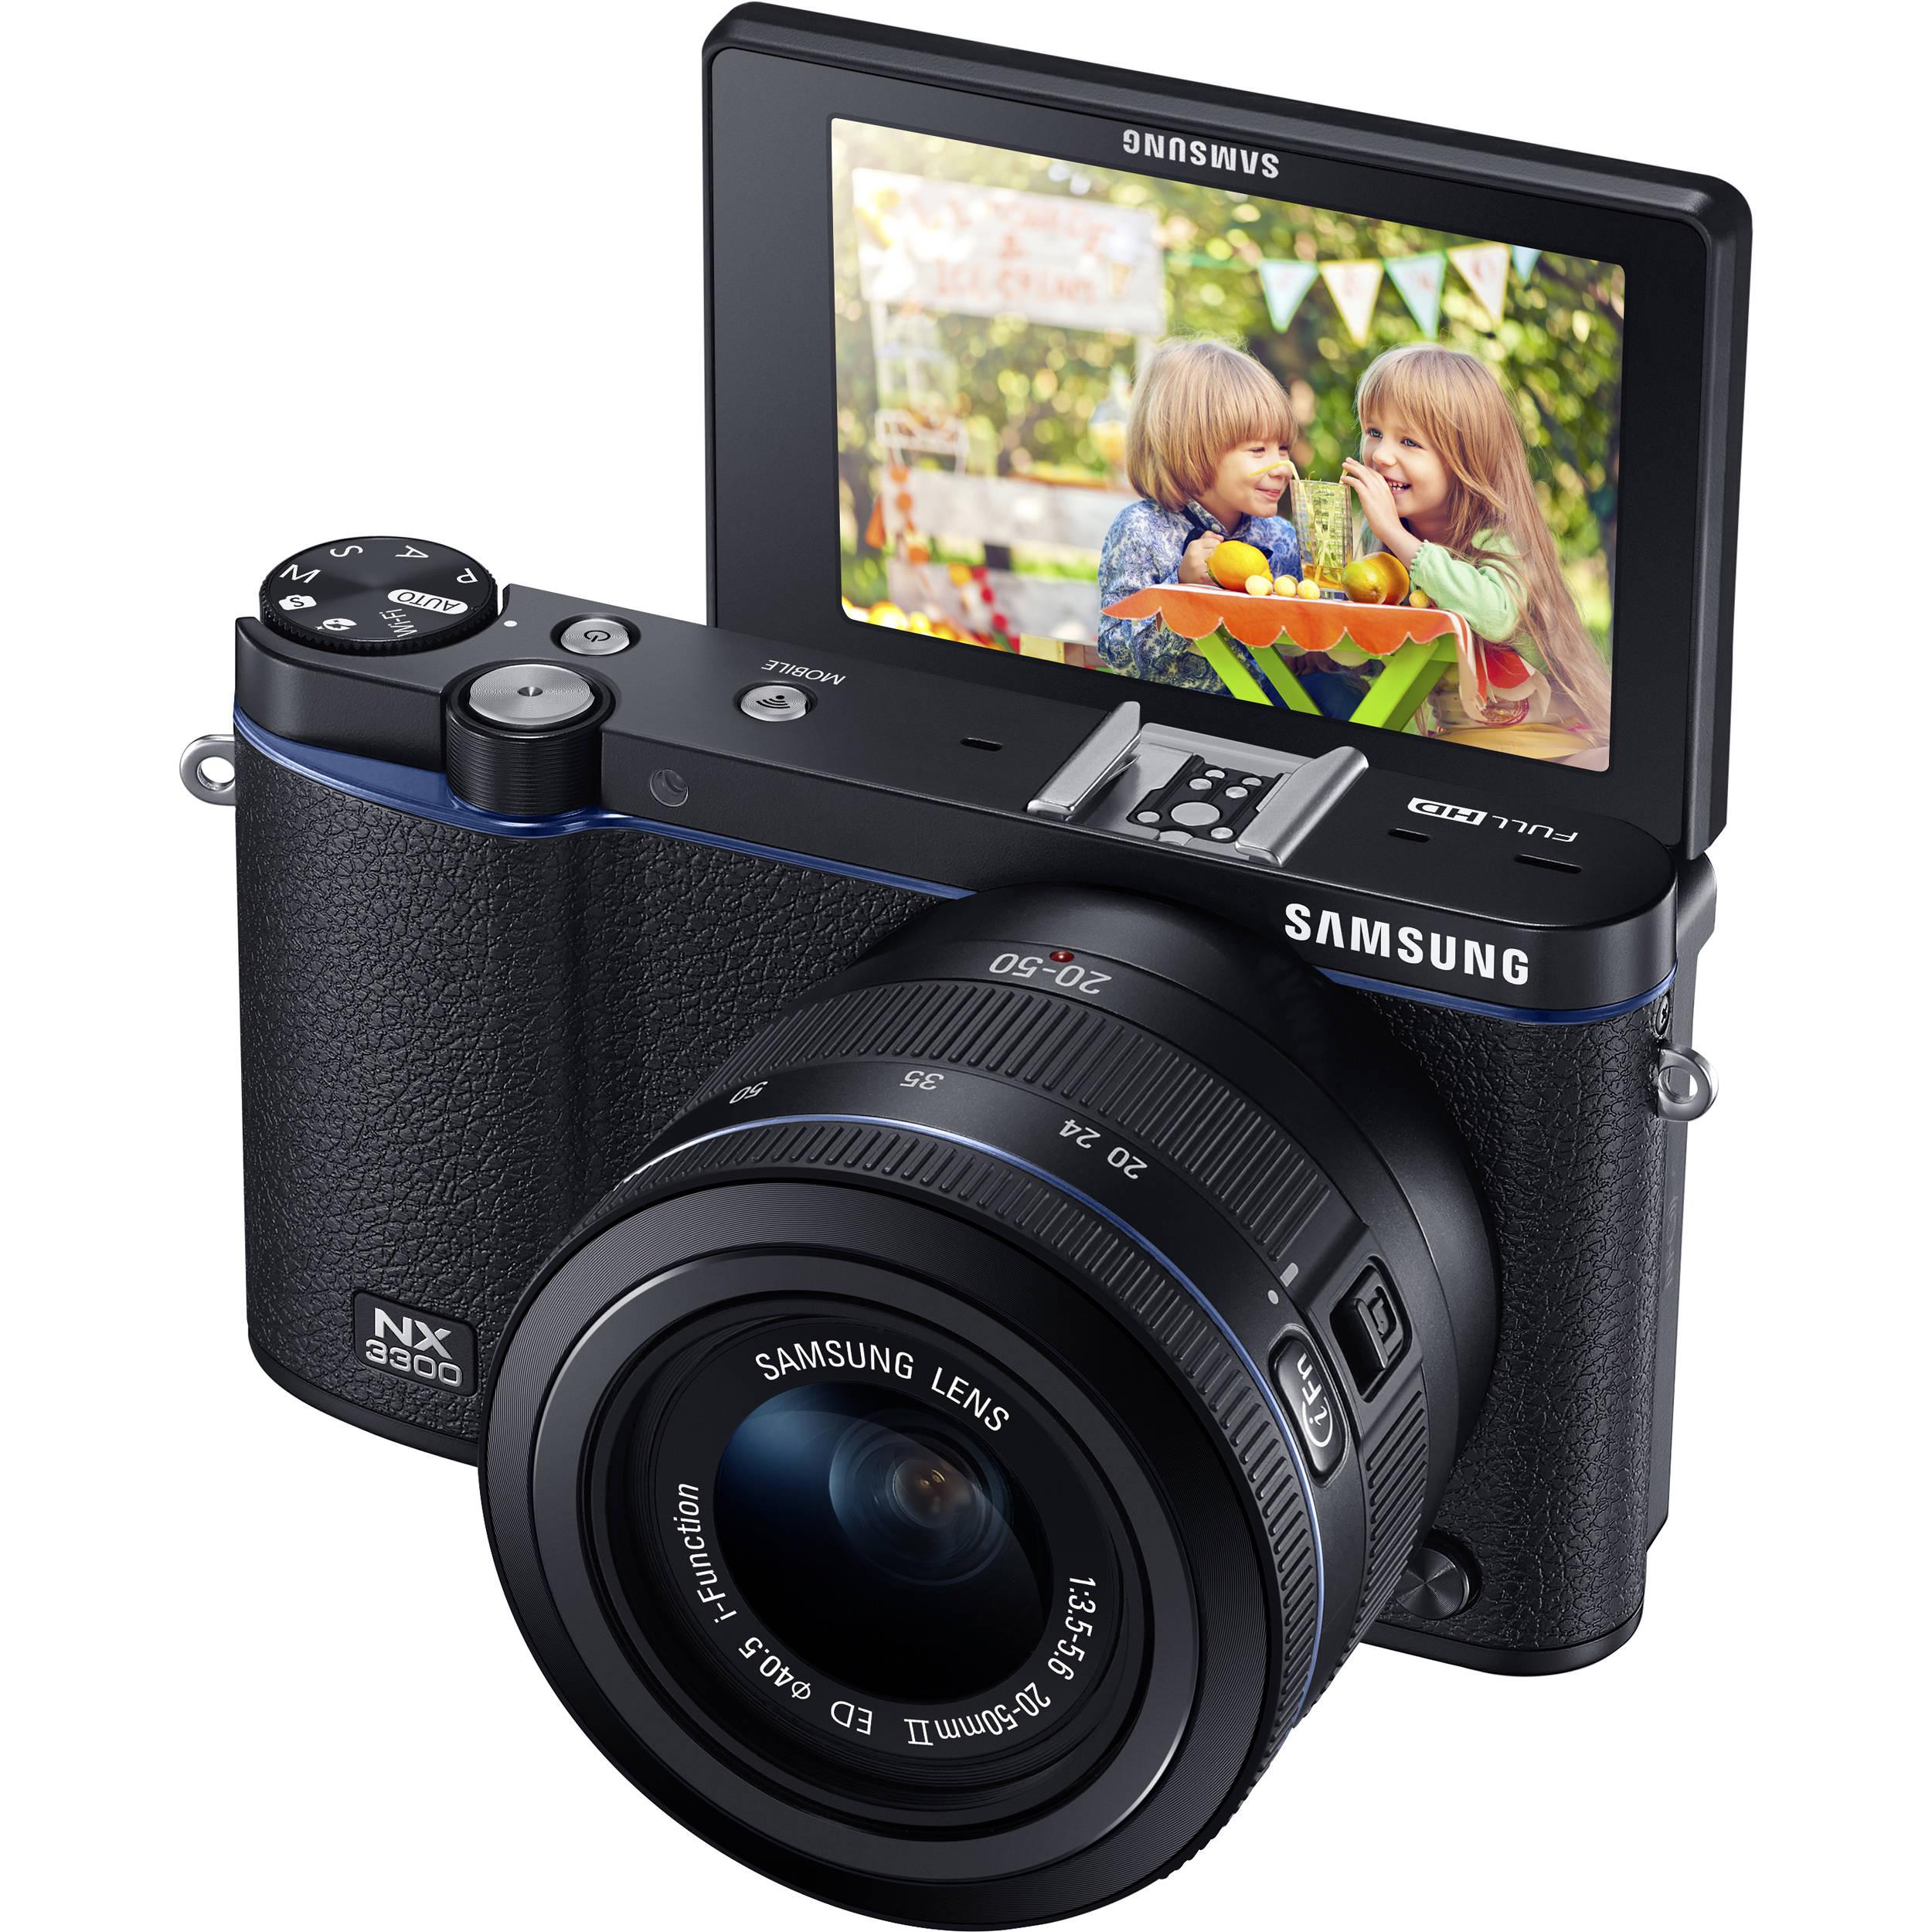 Samsung NX3300 Mirrorless Digital Camera EV-NX3300BEBUS B&H